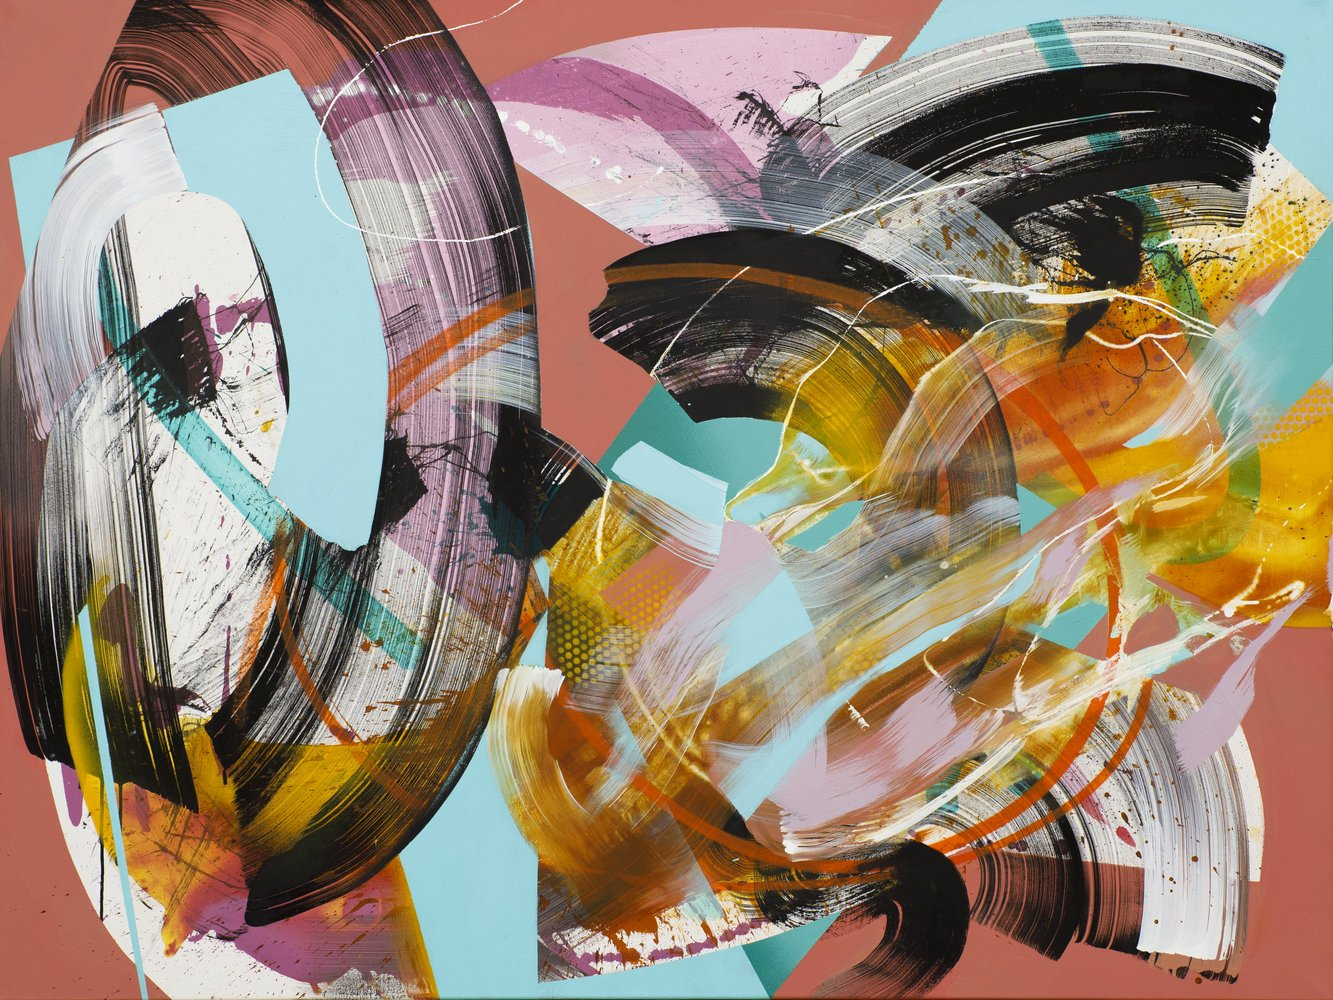 Julia Benz | Bits and Pieces, acrylic, spraypaint on canvas, 120 x 160 cm, 2021